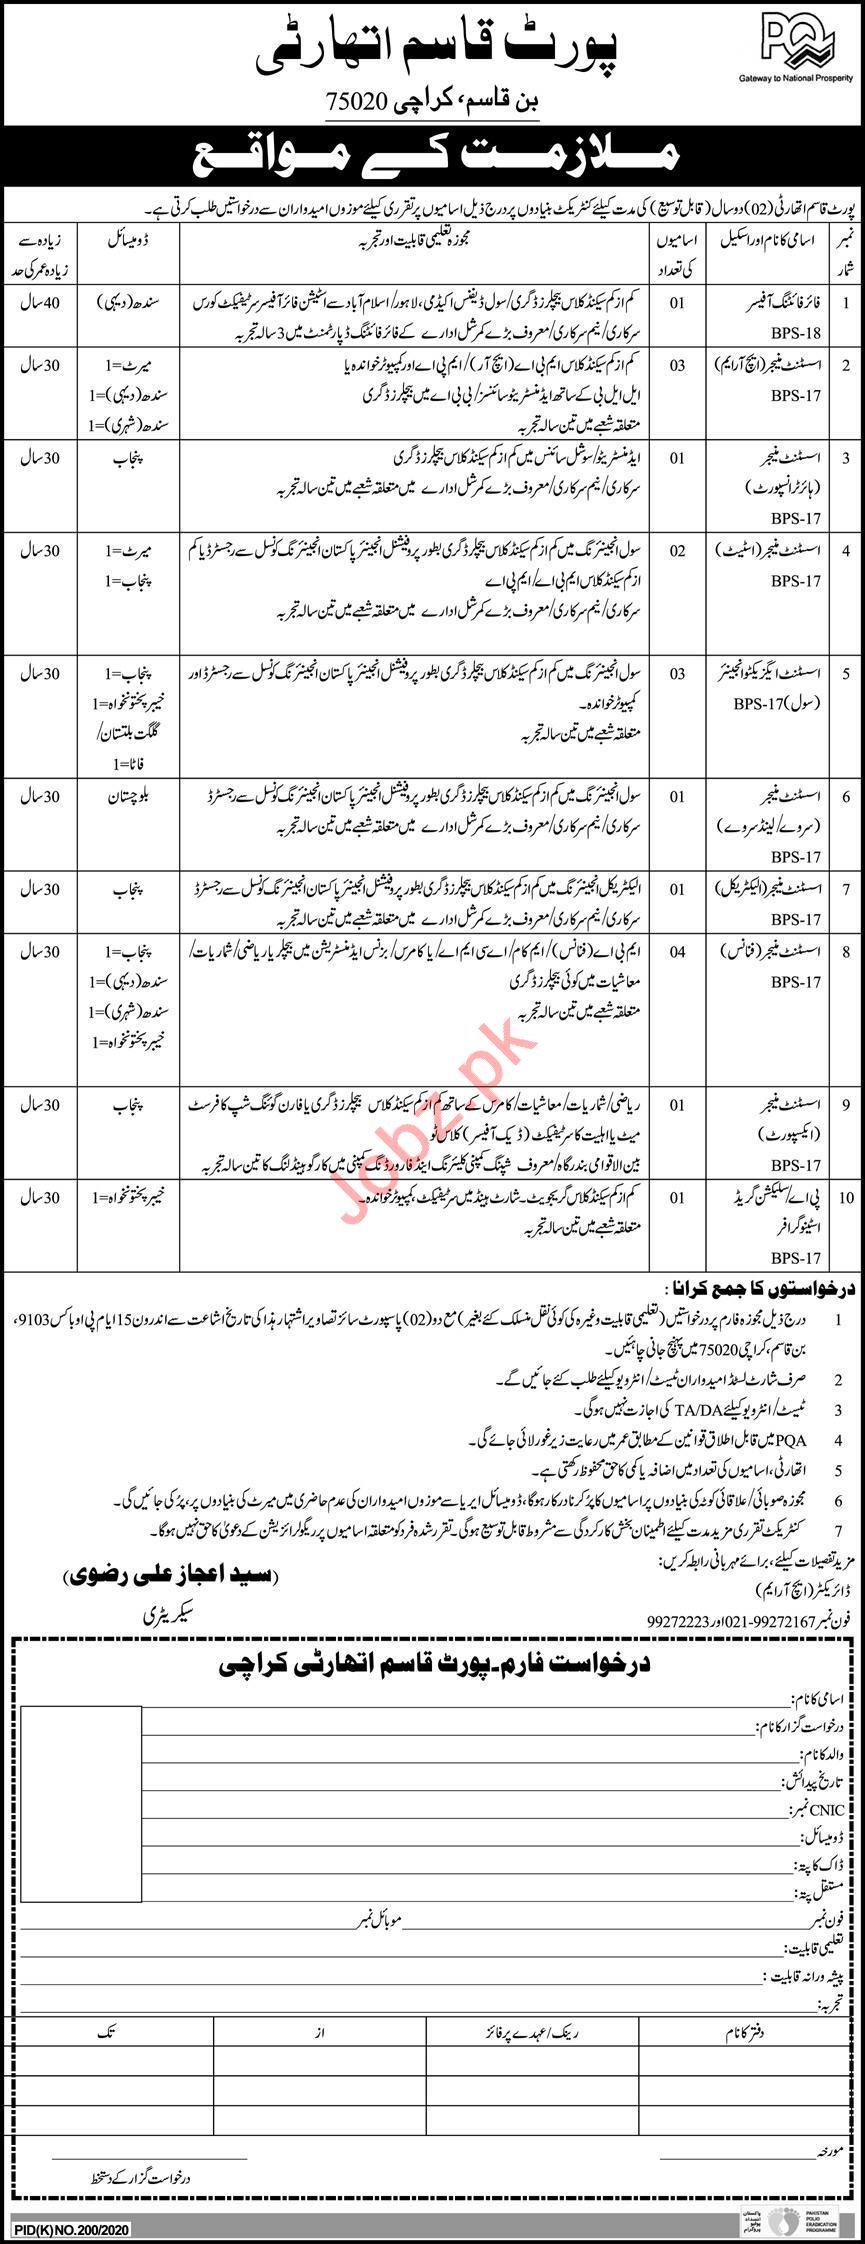 Port Qasim Authority PQA Karachi Jobs 2020 for Asst Managers